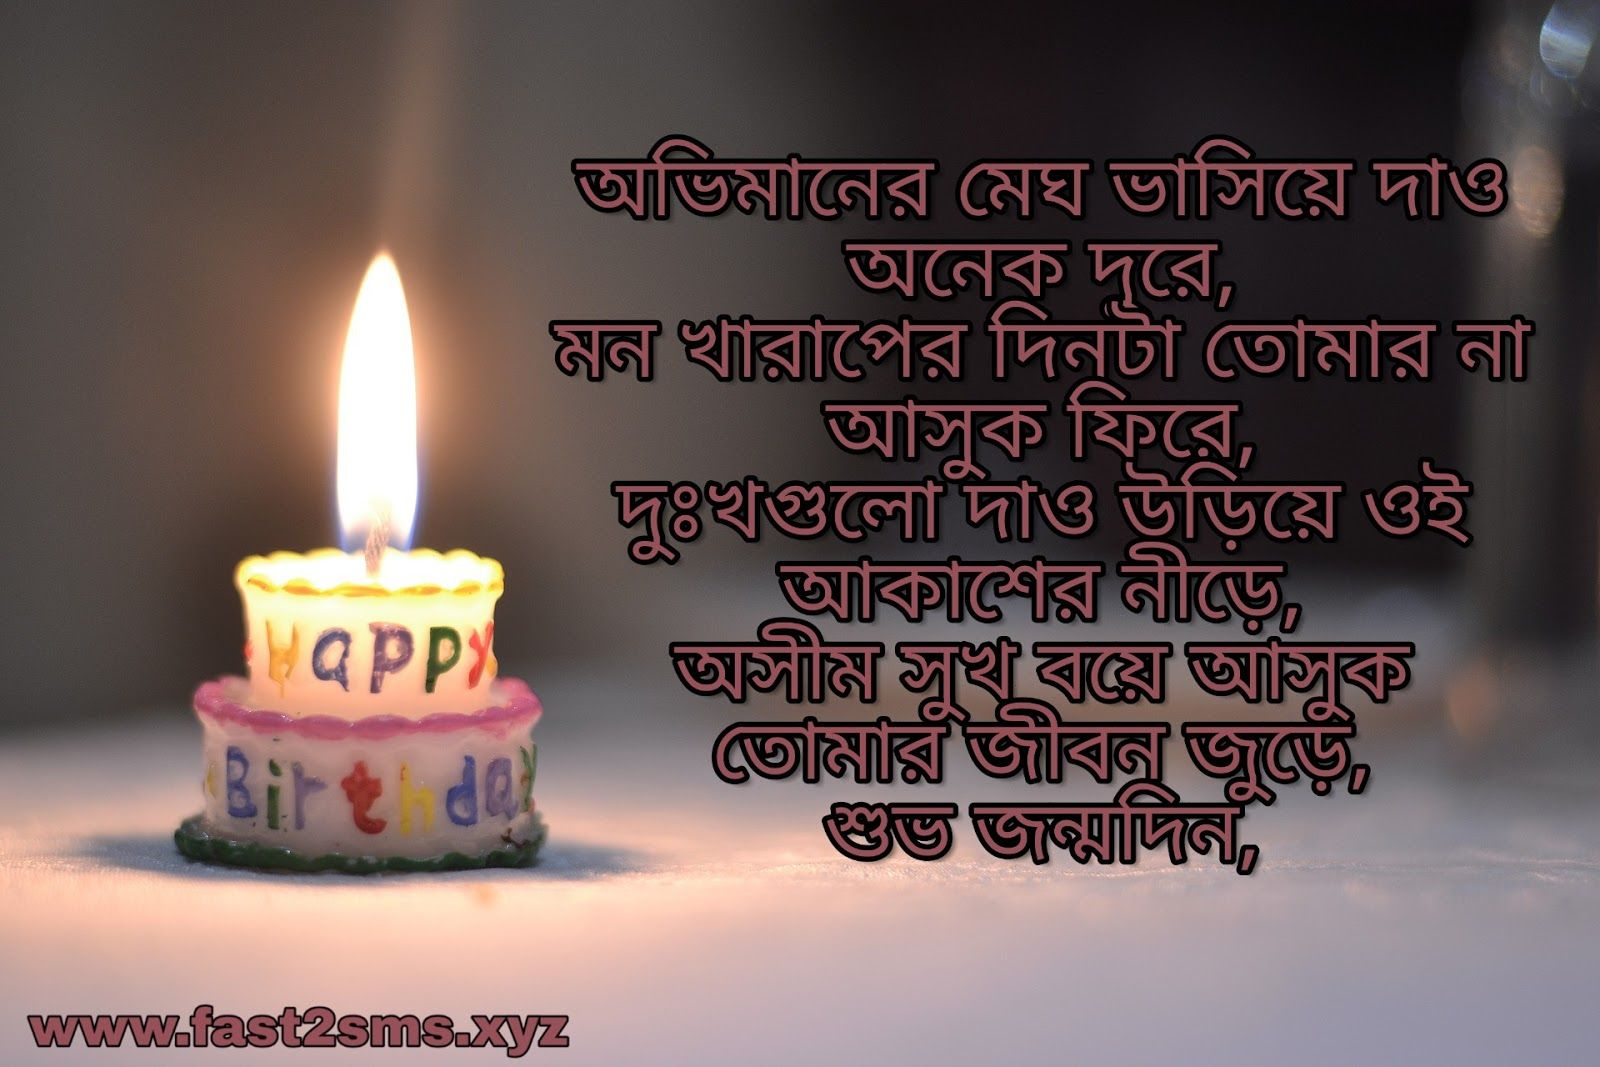 happy birthday bangla sms bengali birthday image by